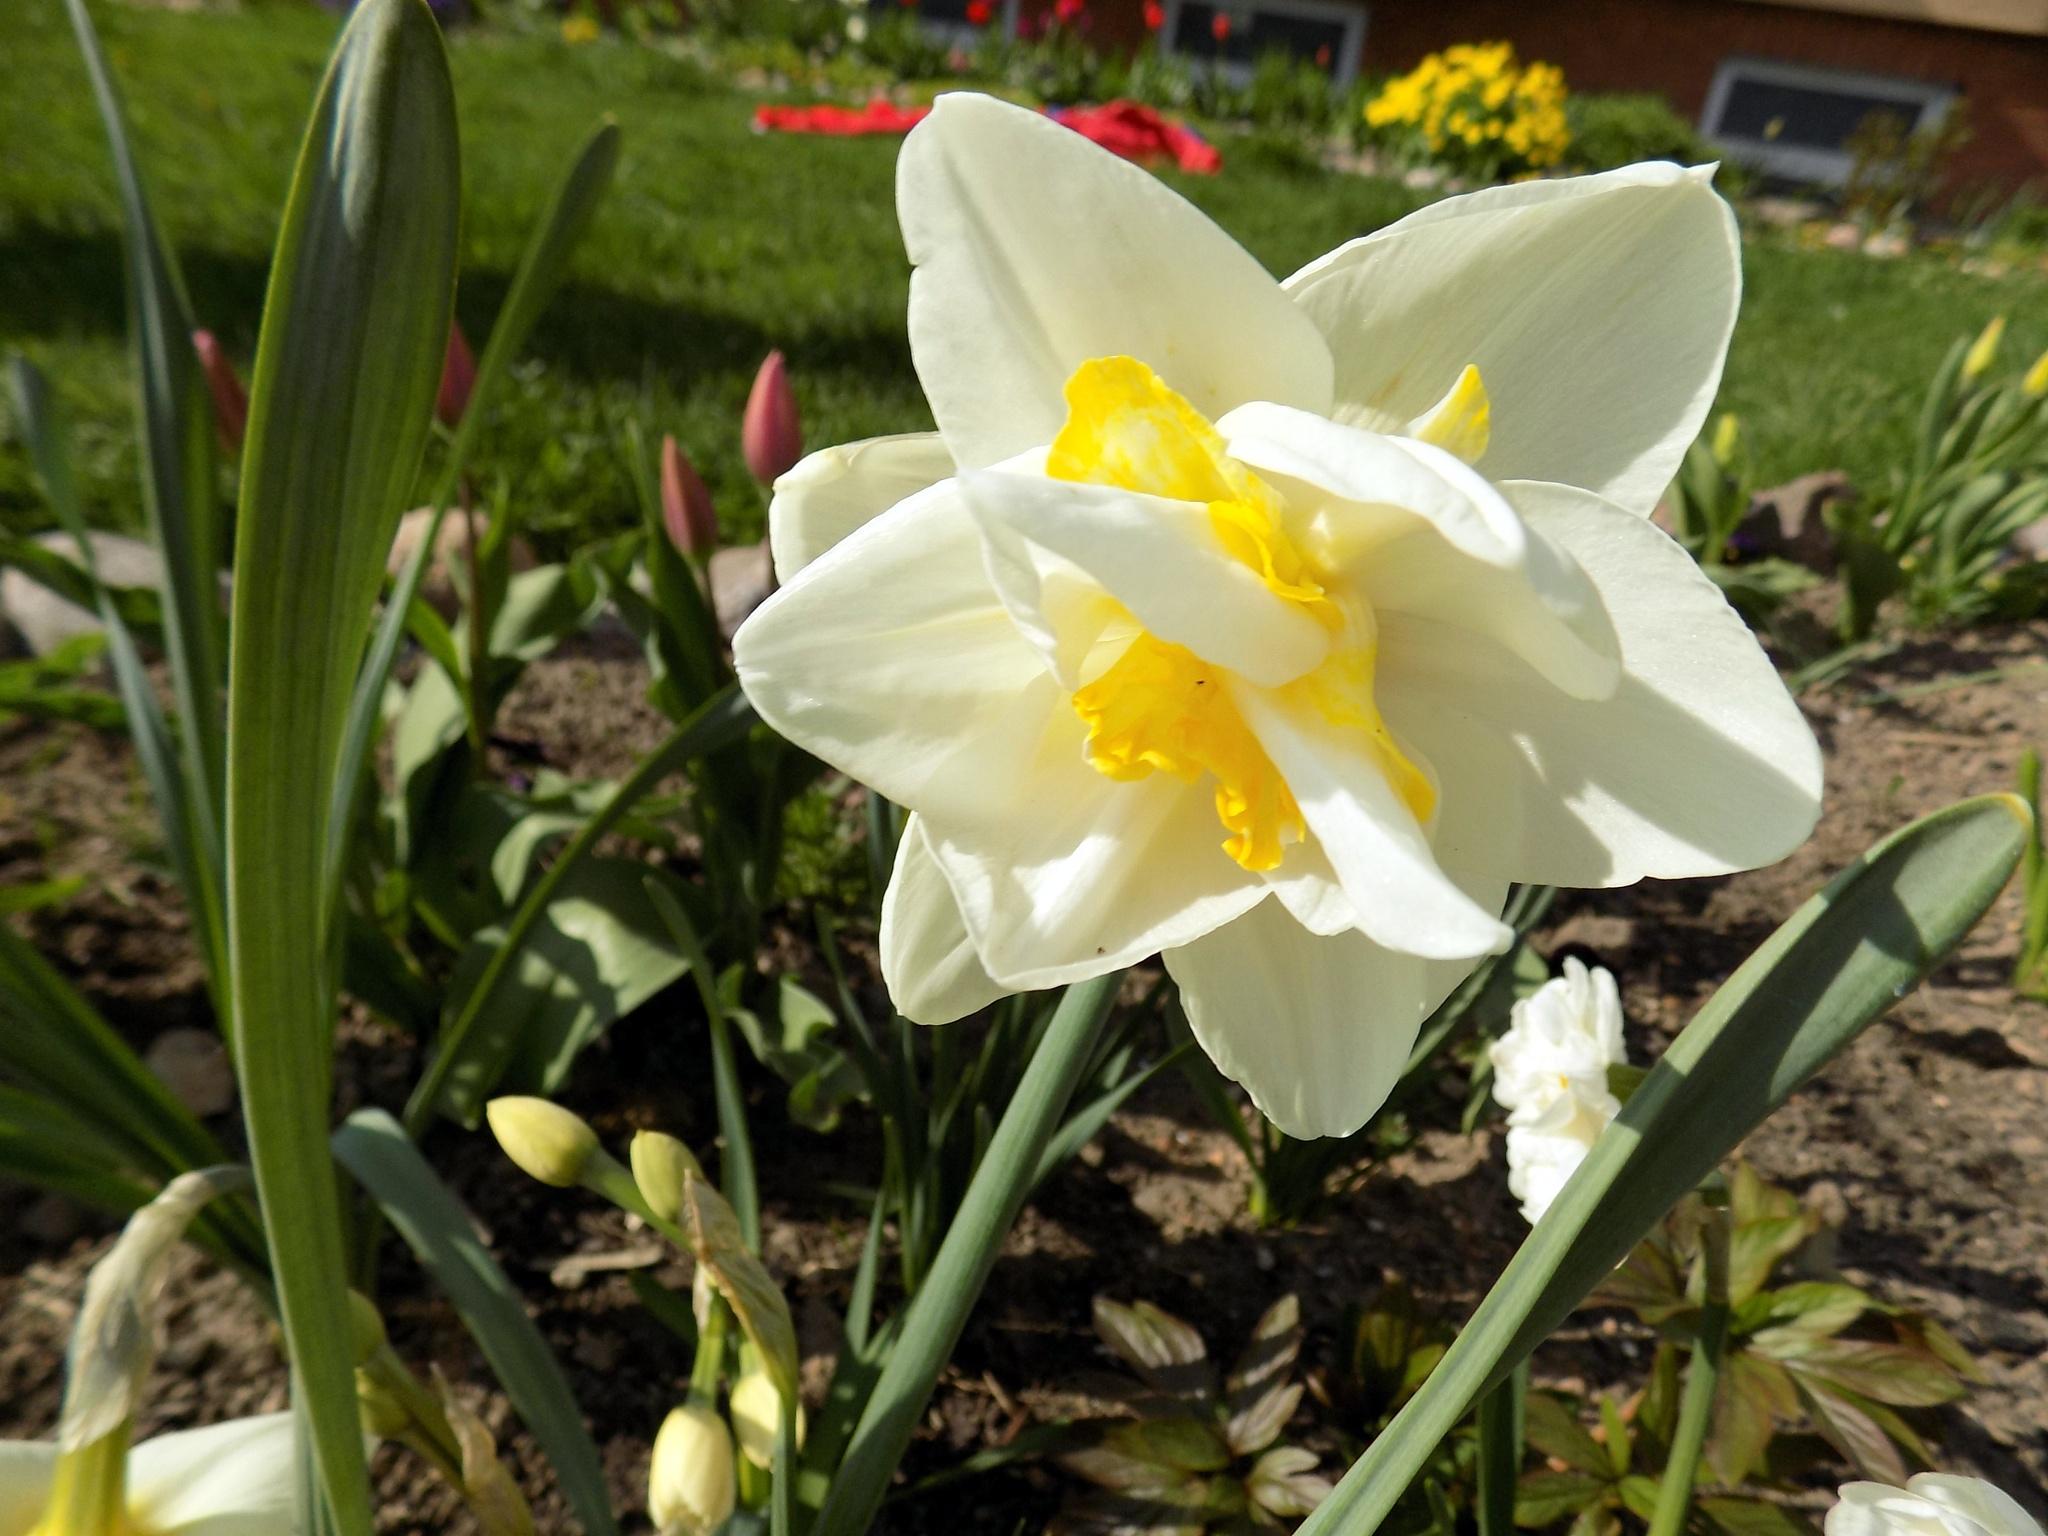 Daffodils by uzkuraitiene62